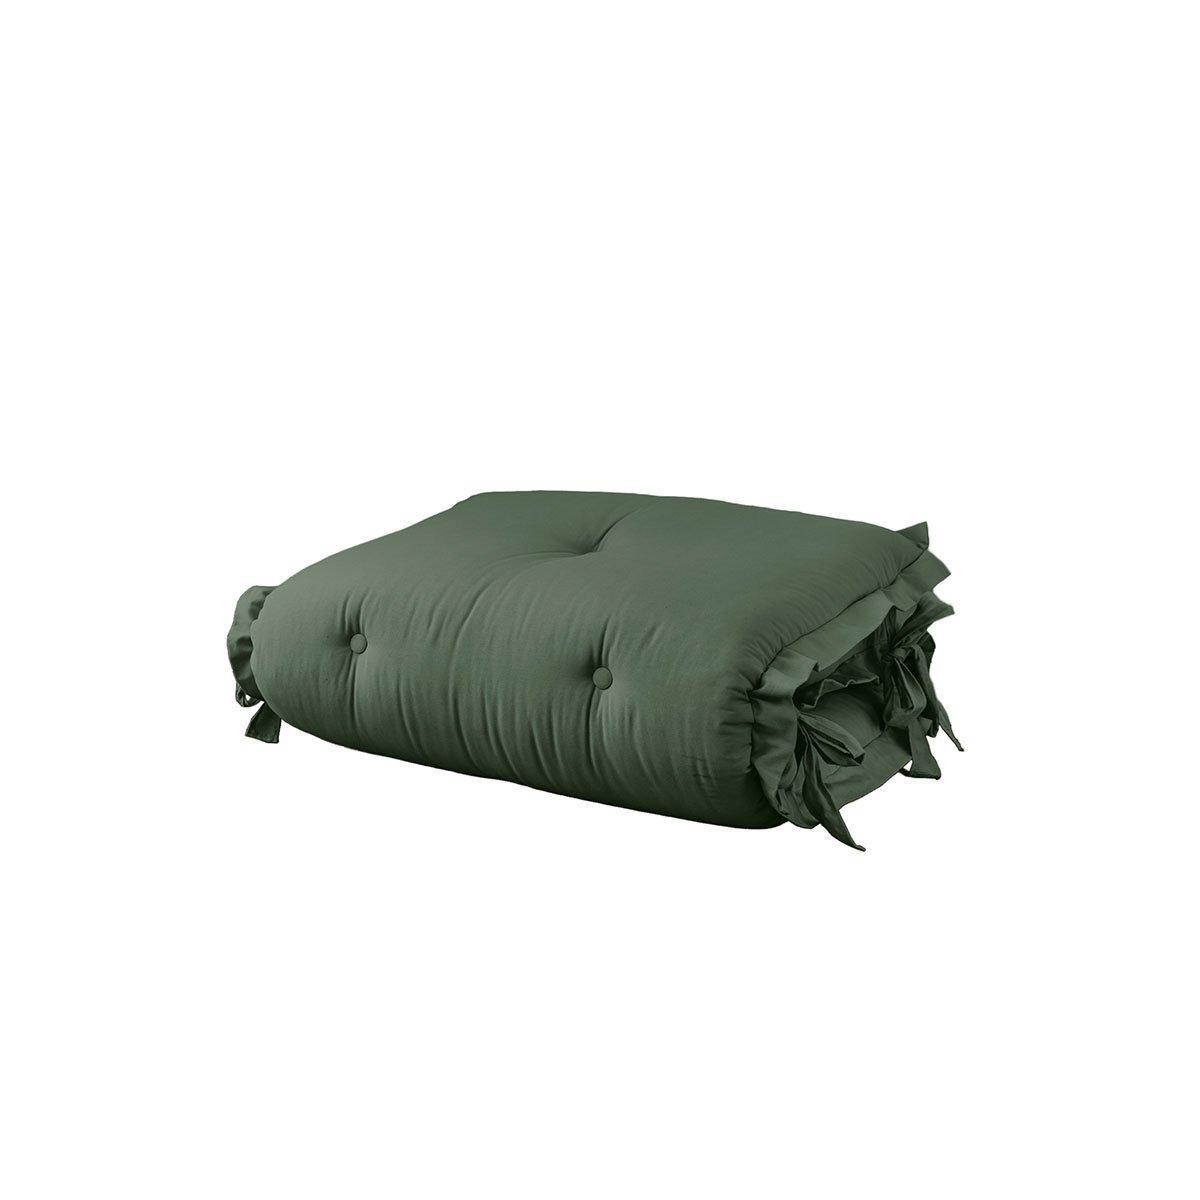 Variabilný matrac Sit And Sleep – Olive Green